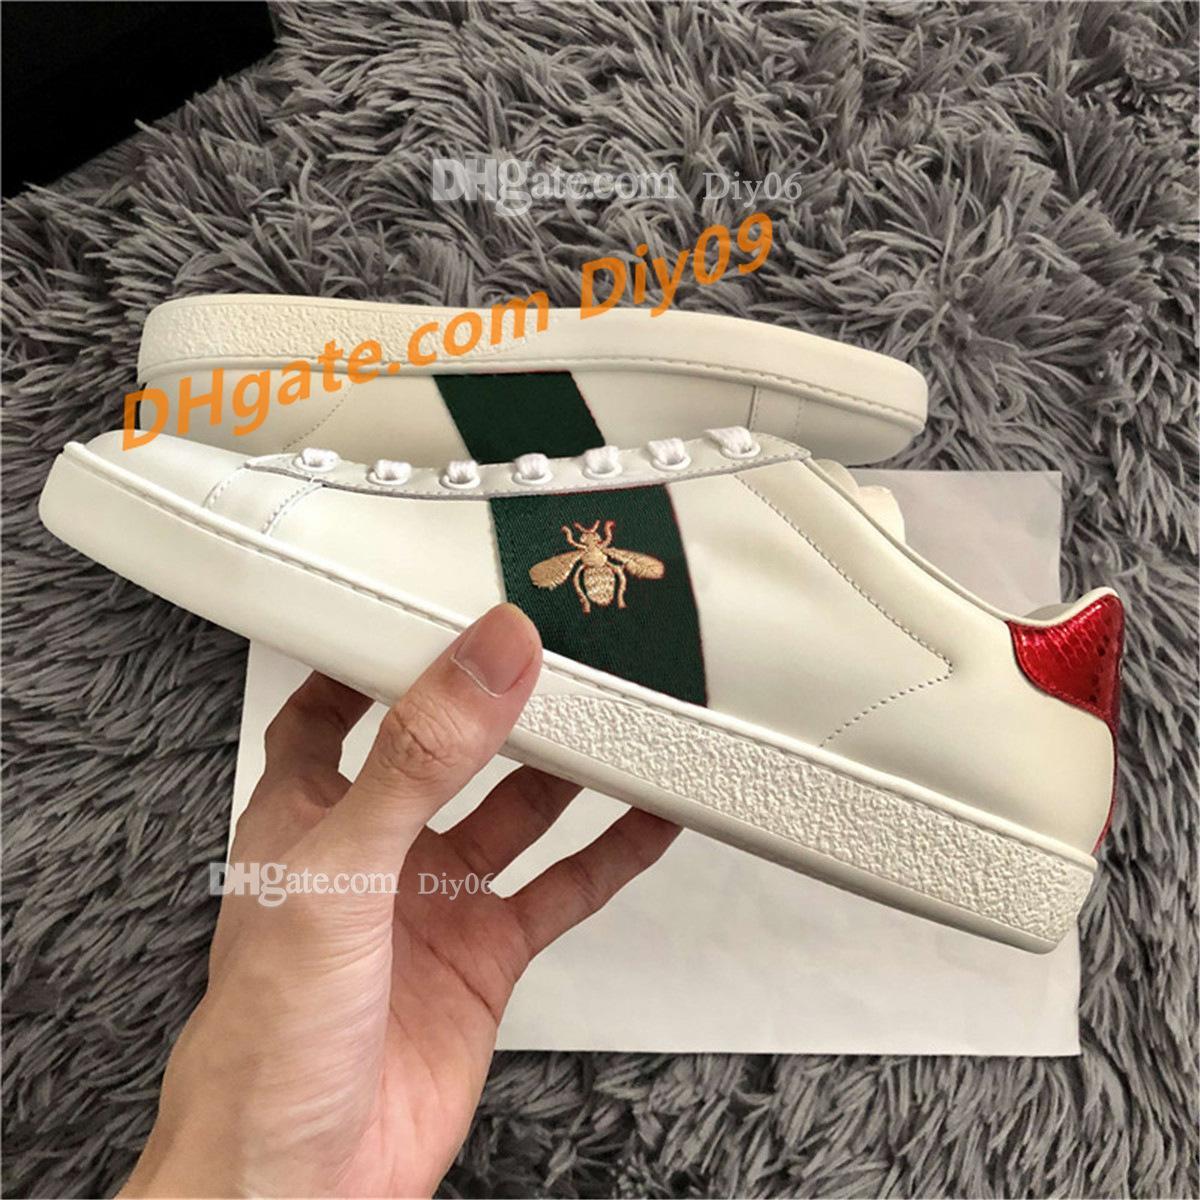 Gner Luxurys Designers Men Femmes Chaussures Sneakers Séparent Design Ace Broderie Bee TIGE TIGE TIGER SNAKE CHIEN CASSAL TRAINATEURS UNISEXE UNISEXE